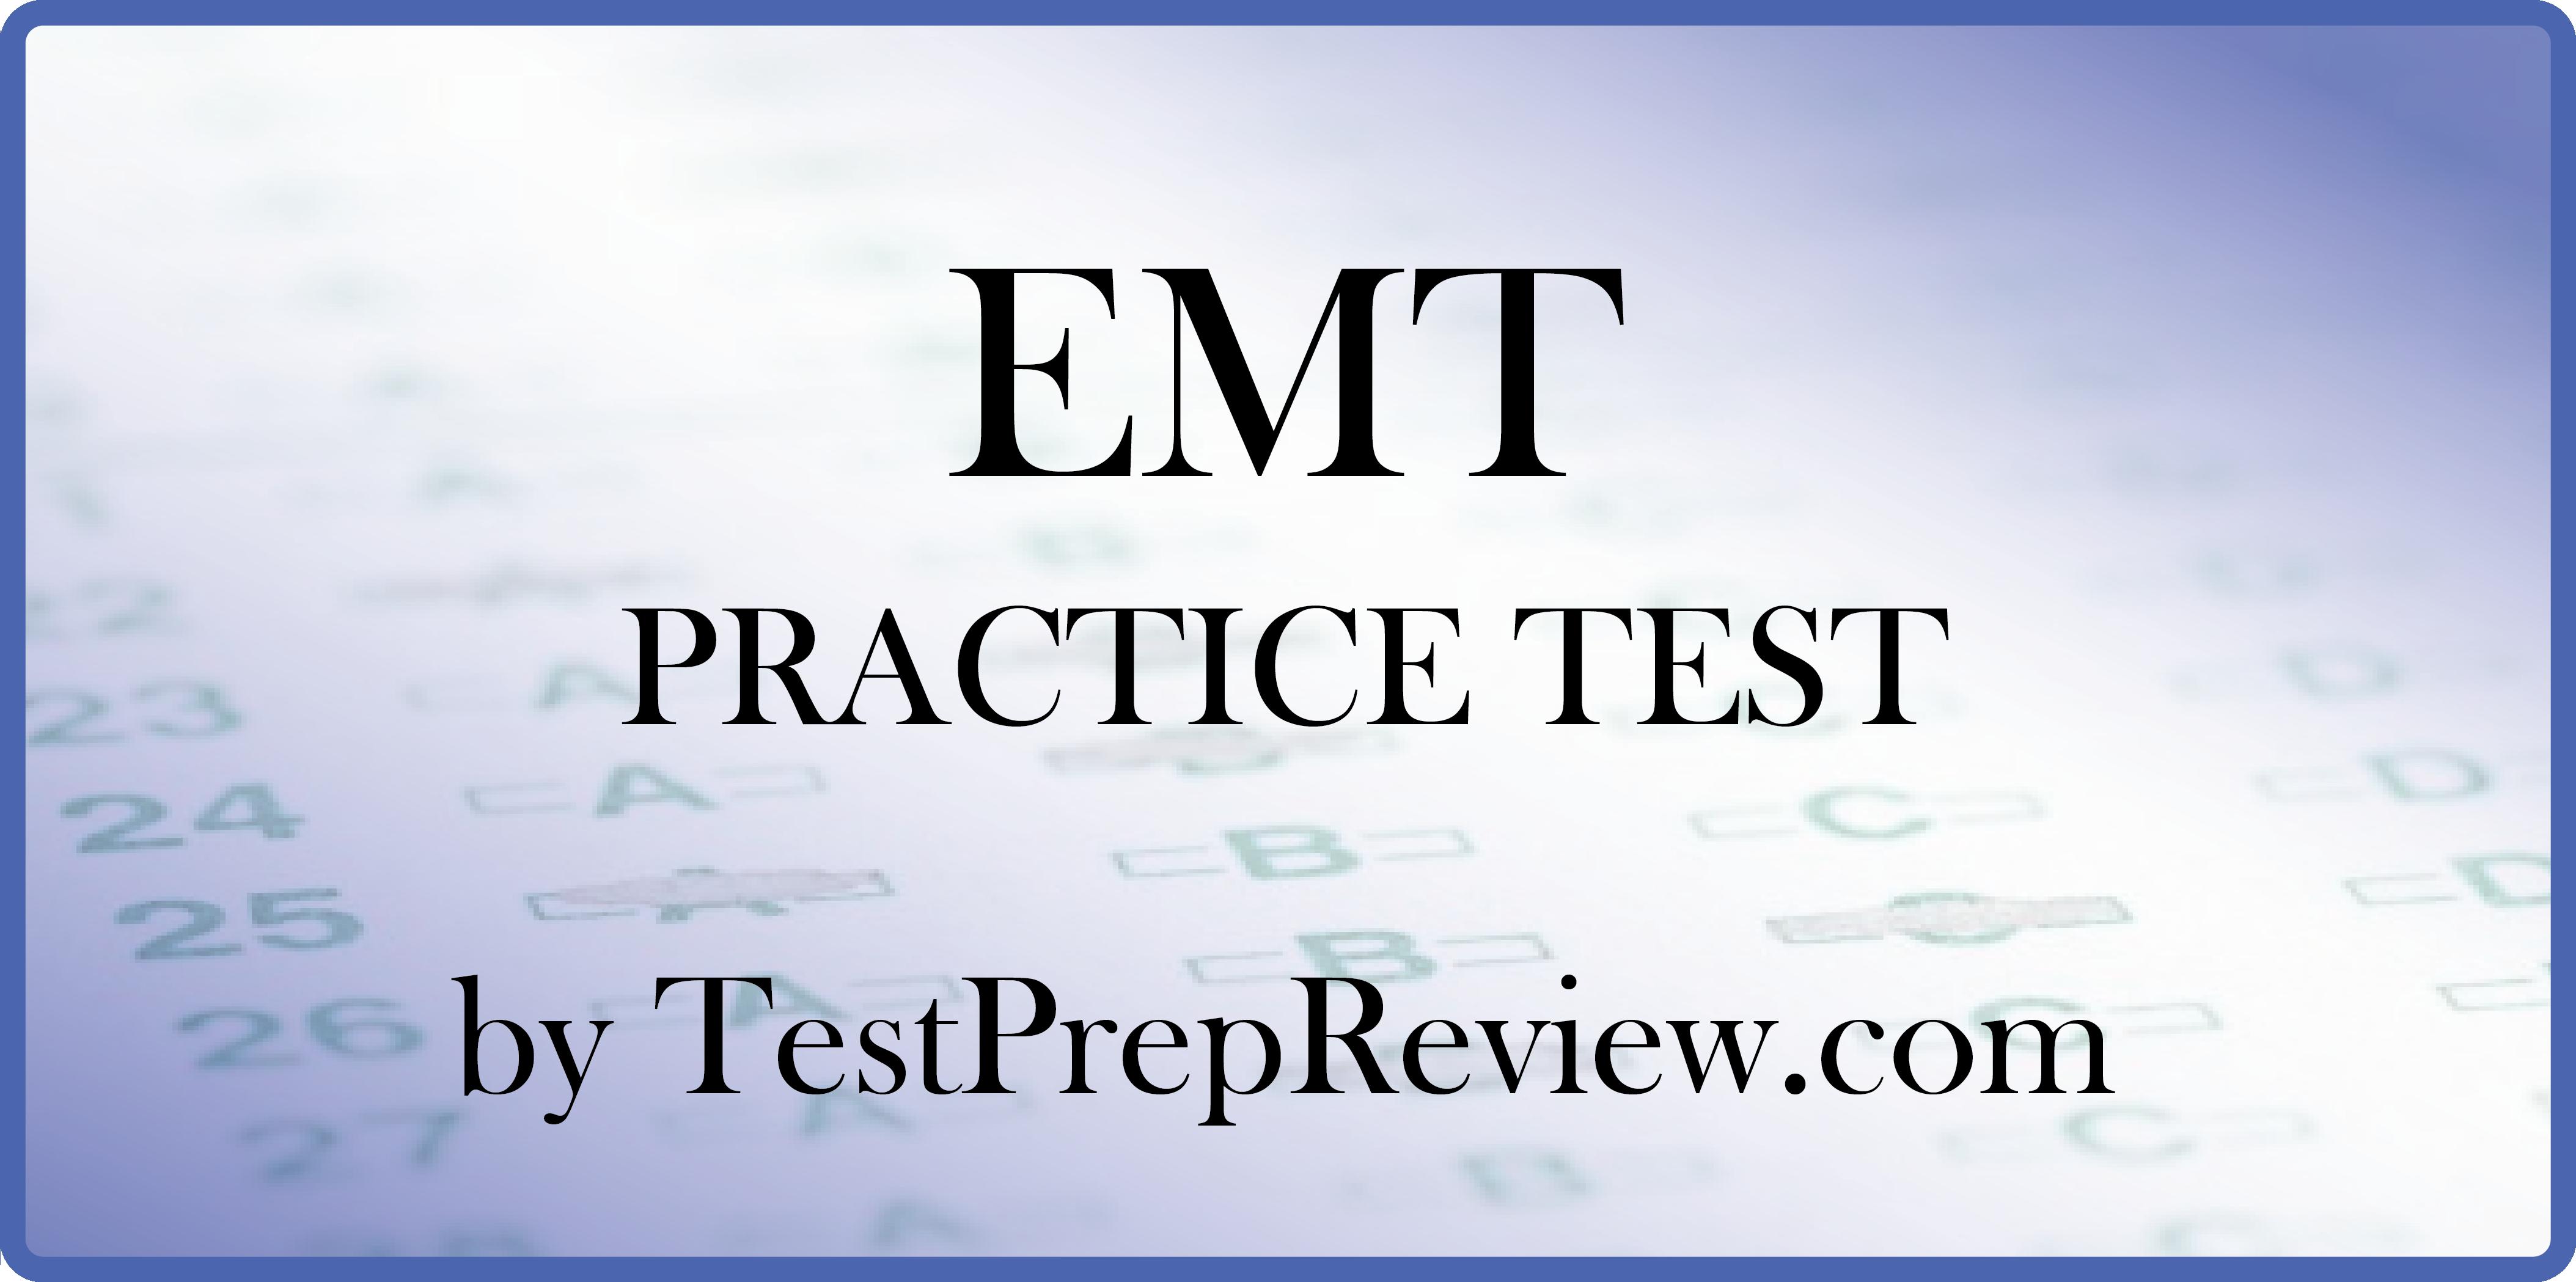 Free Aemt Study Guide Hp Pavilion Tx1000 Tablet Pc Block Diagram Array Emt Practice Test Questions By Testprepreview Be Prepared For Rh Pinterest Com